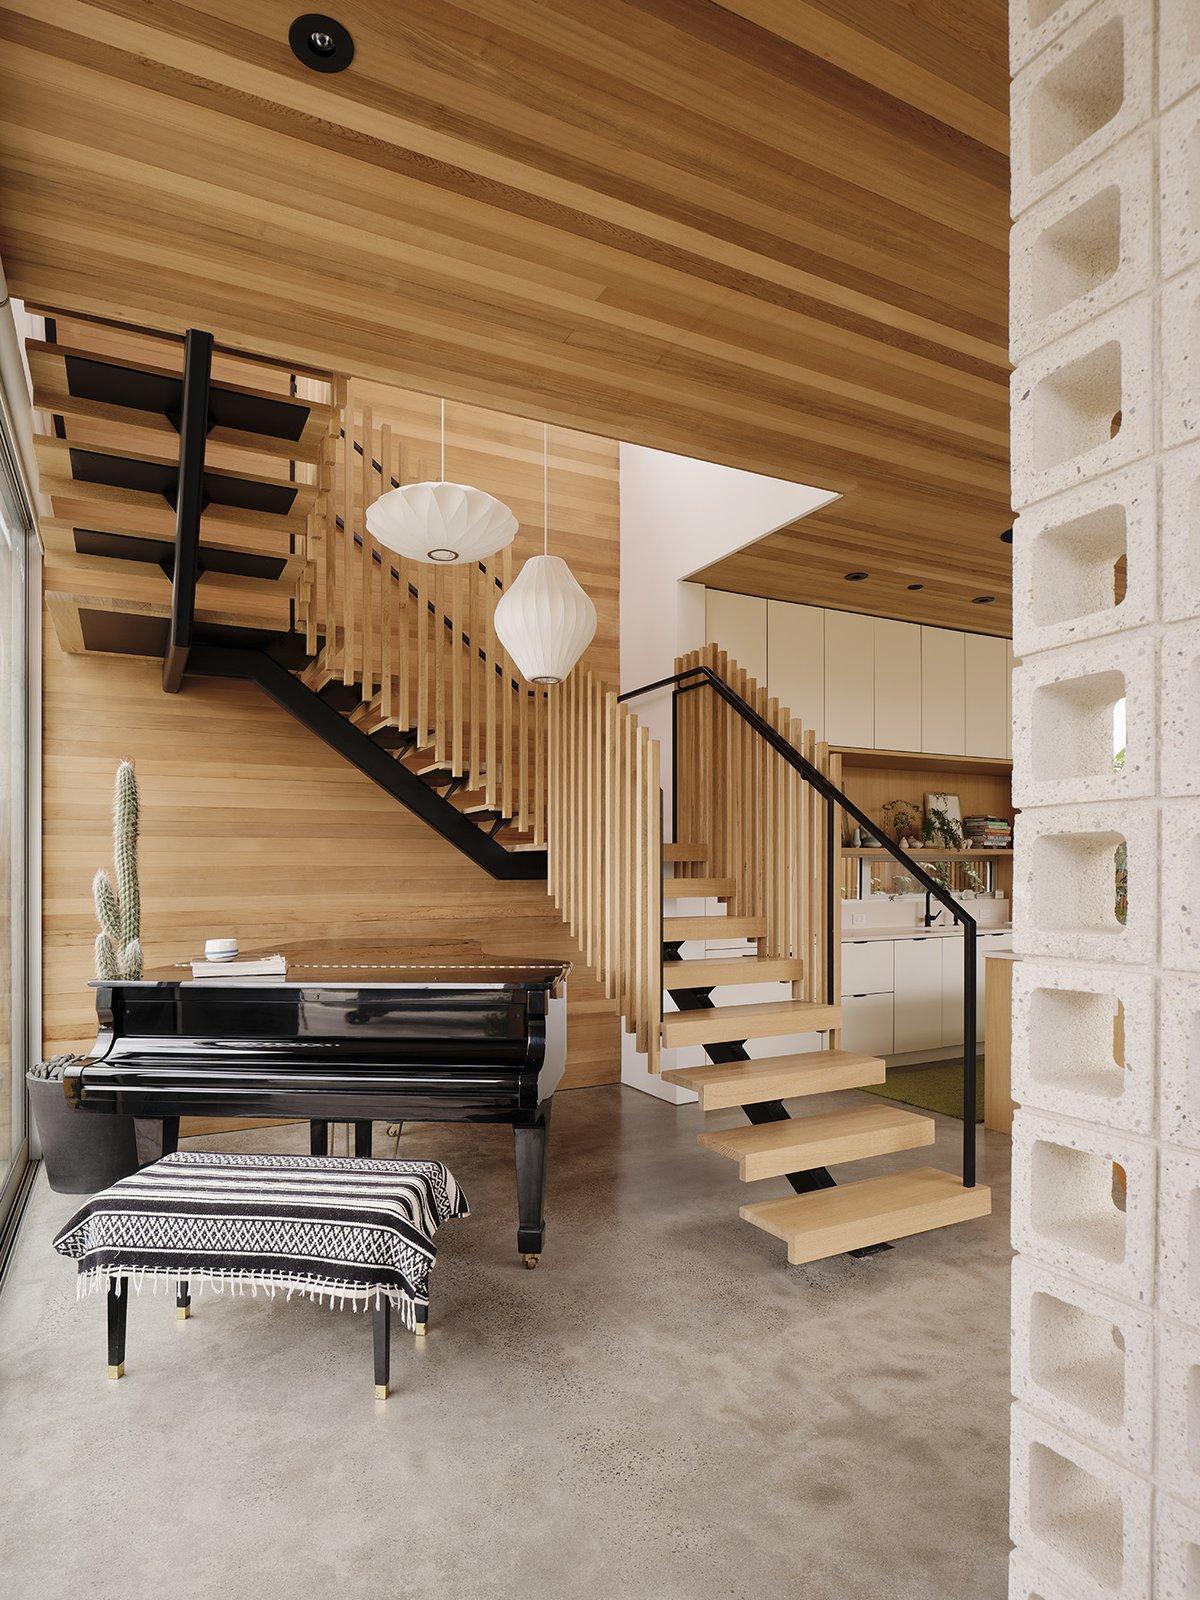 walk-street house-ras-a studio